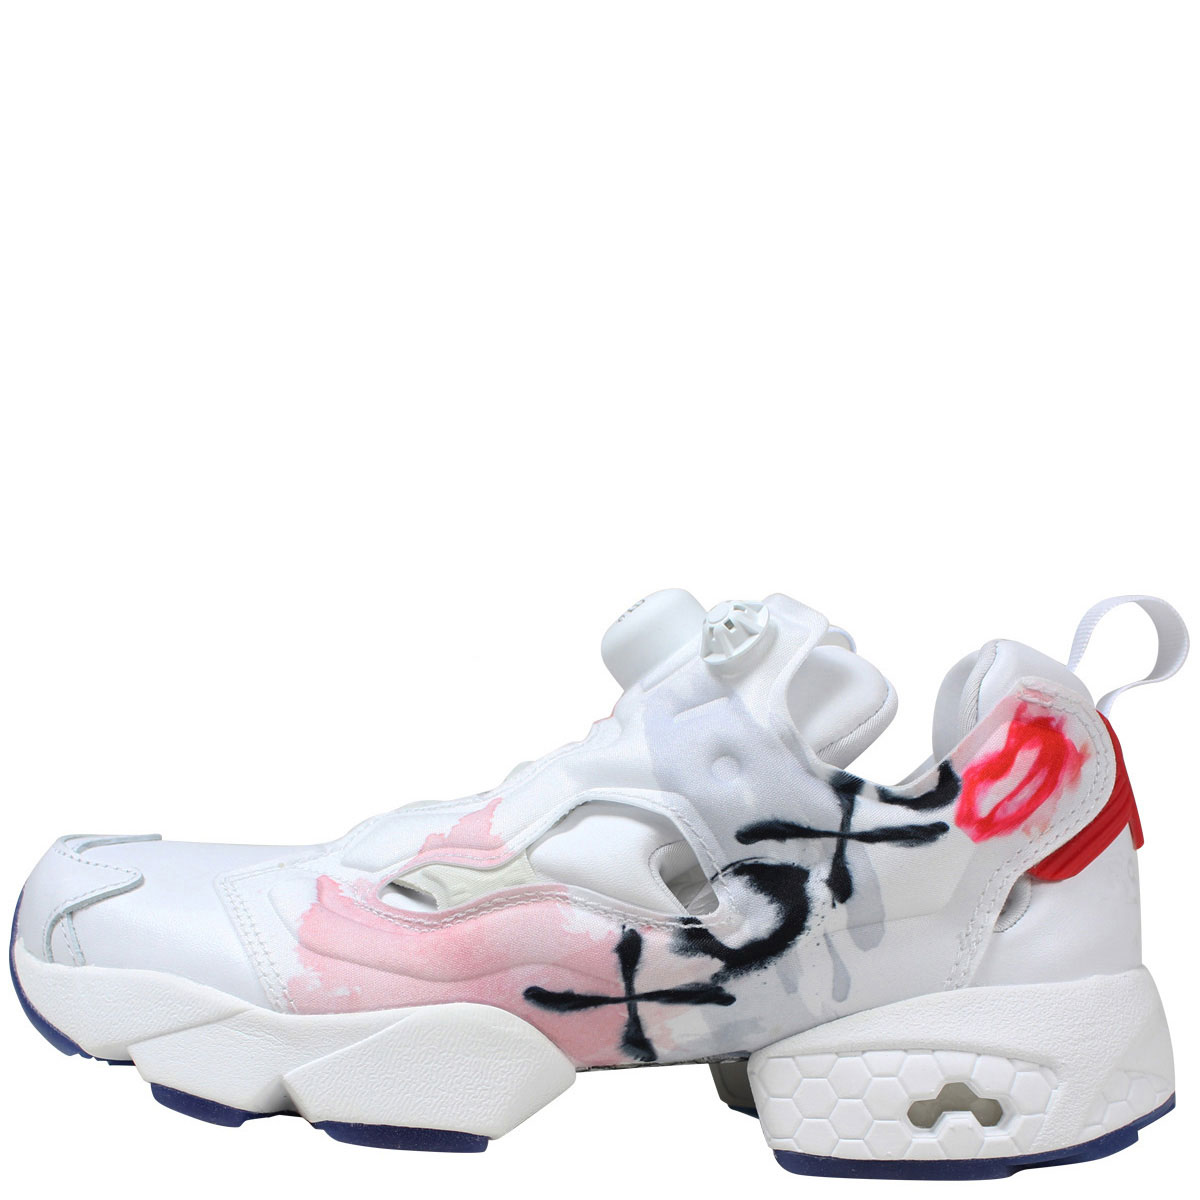 best website 02571 824b9 Reebok Reebok pump fury cerebrate sneakers Womens INSTAPUMP FURY CELEBRATE  V69142 shoes white [★ 10.